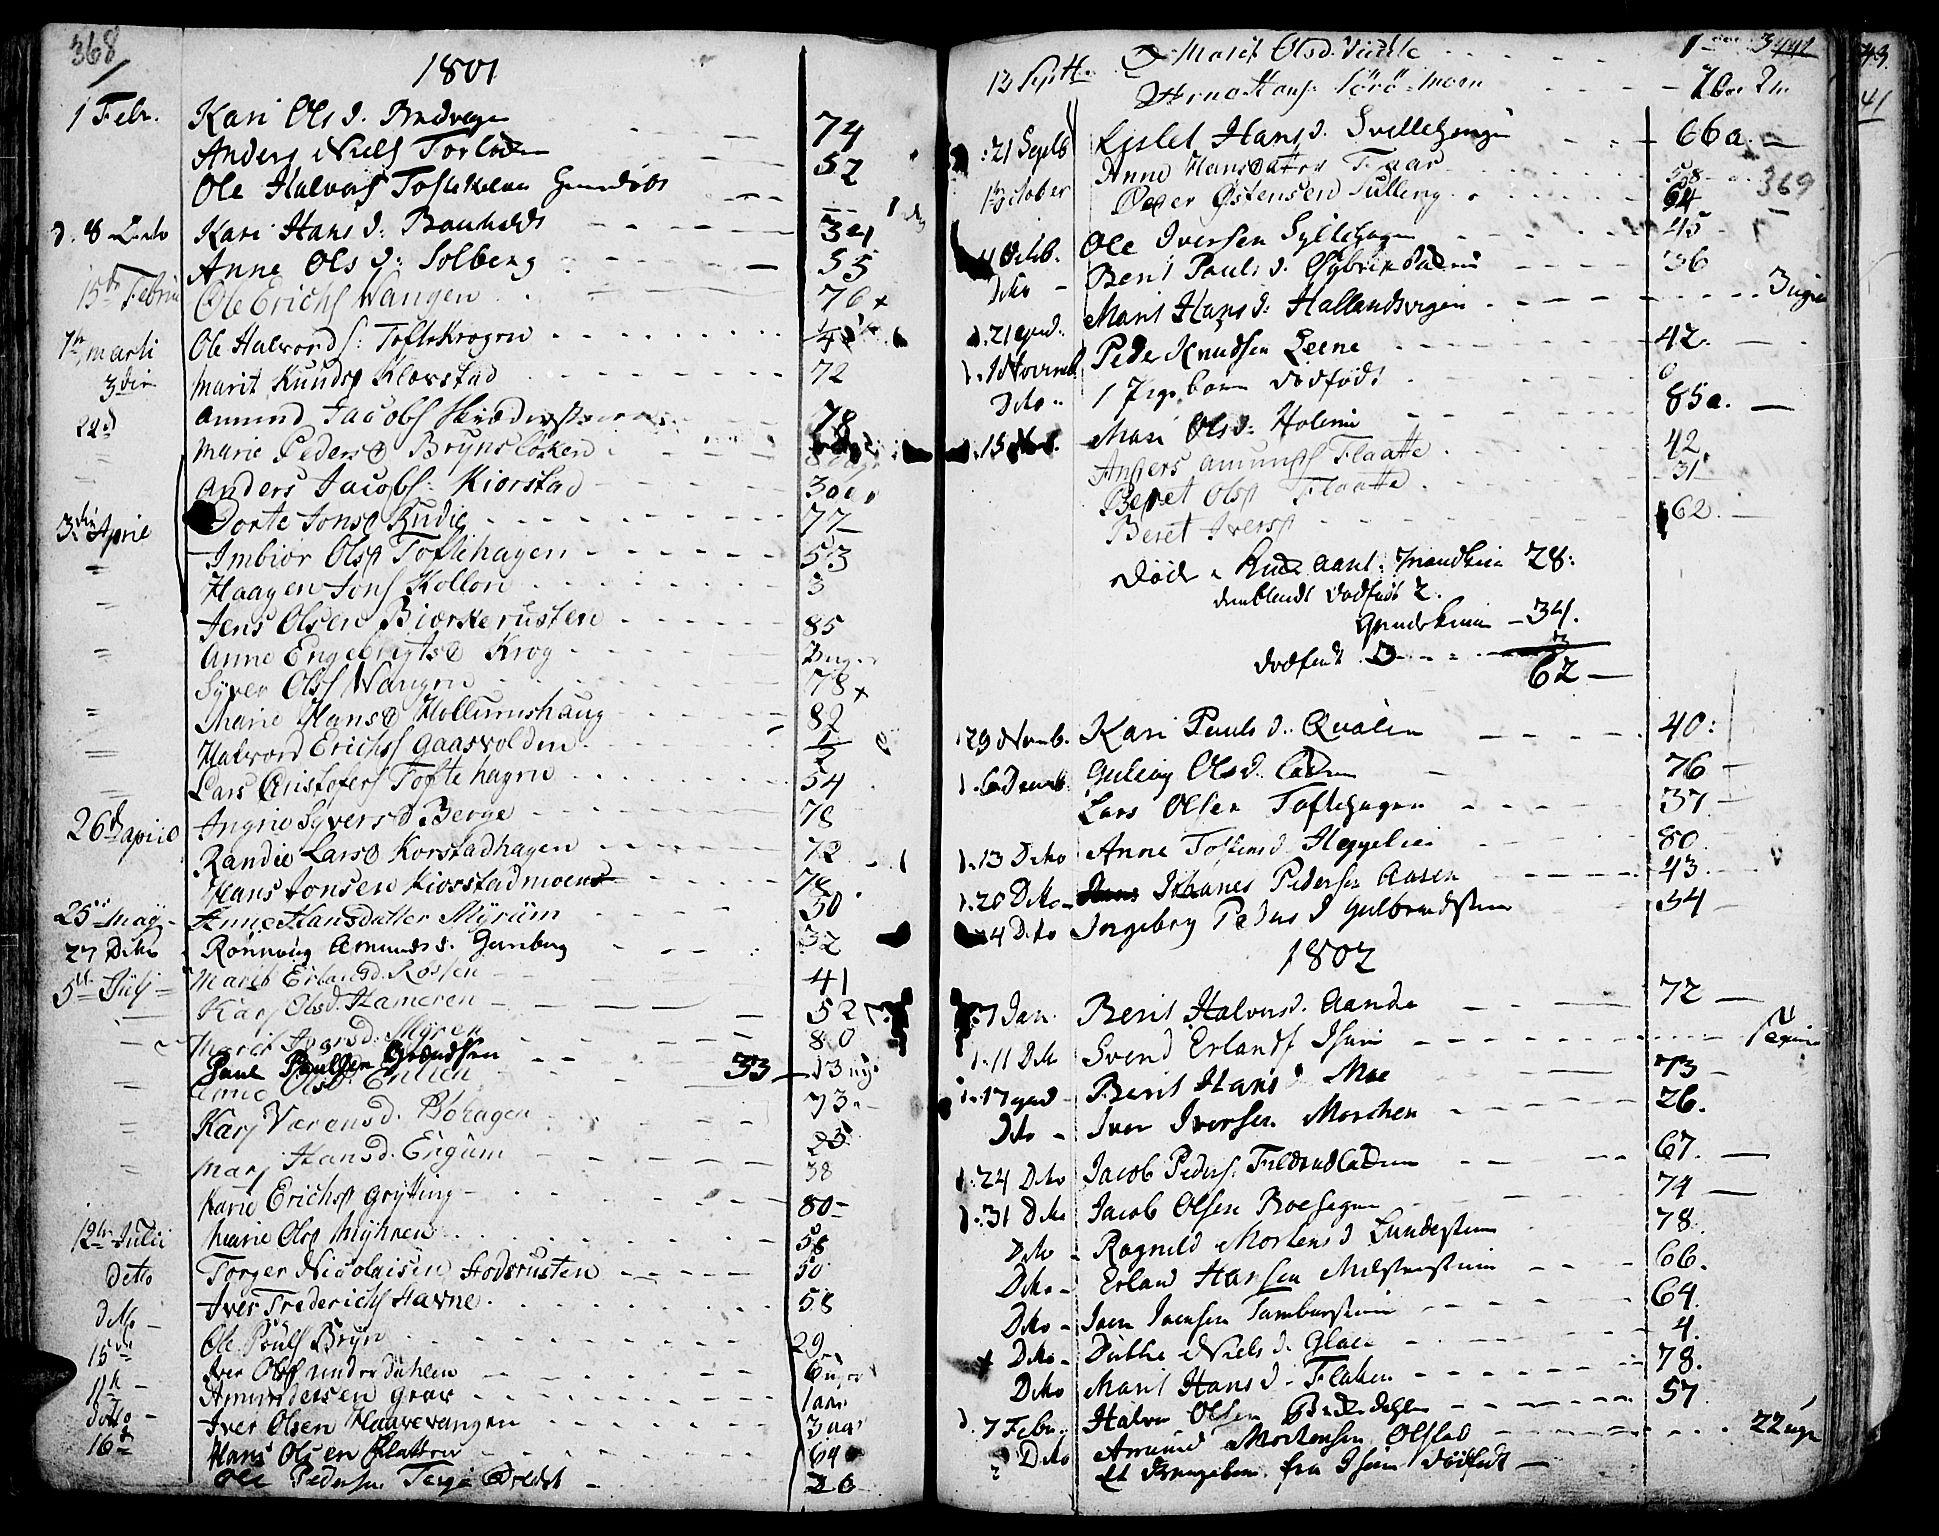 SAH, Fron prestekontor, H/Ha/Haa/L0001: Ministerialbok nr. 1, 1799-1816, s. 368-369